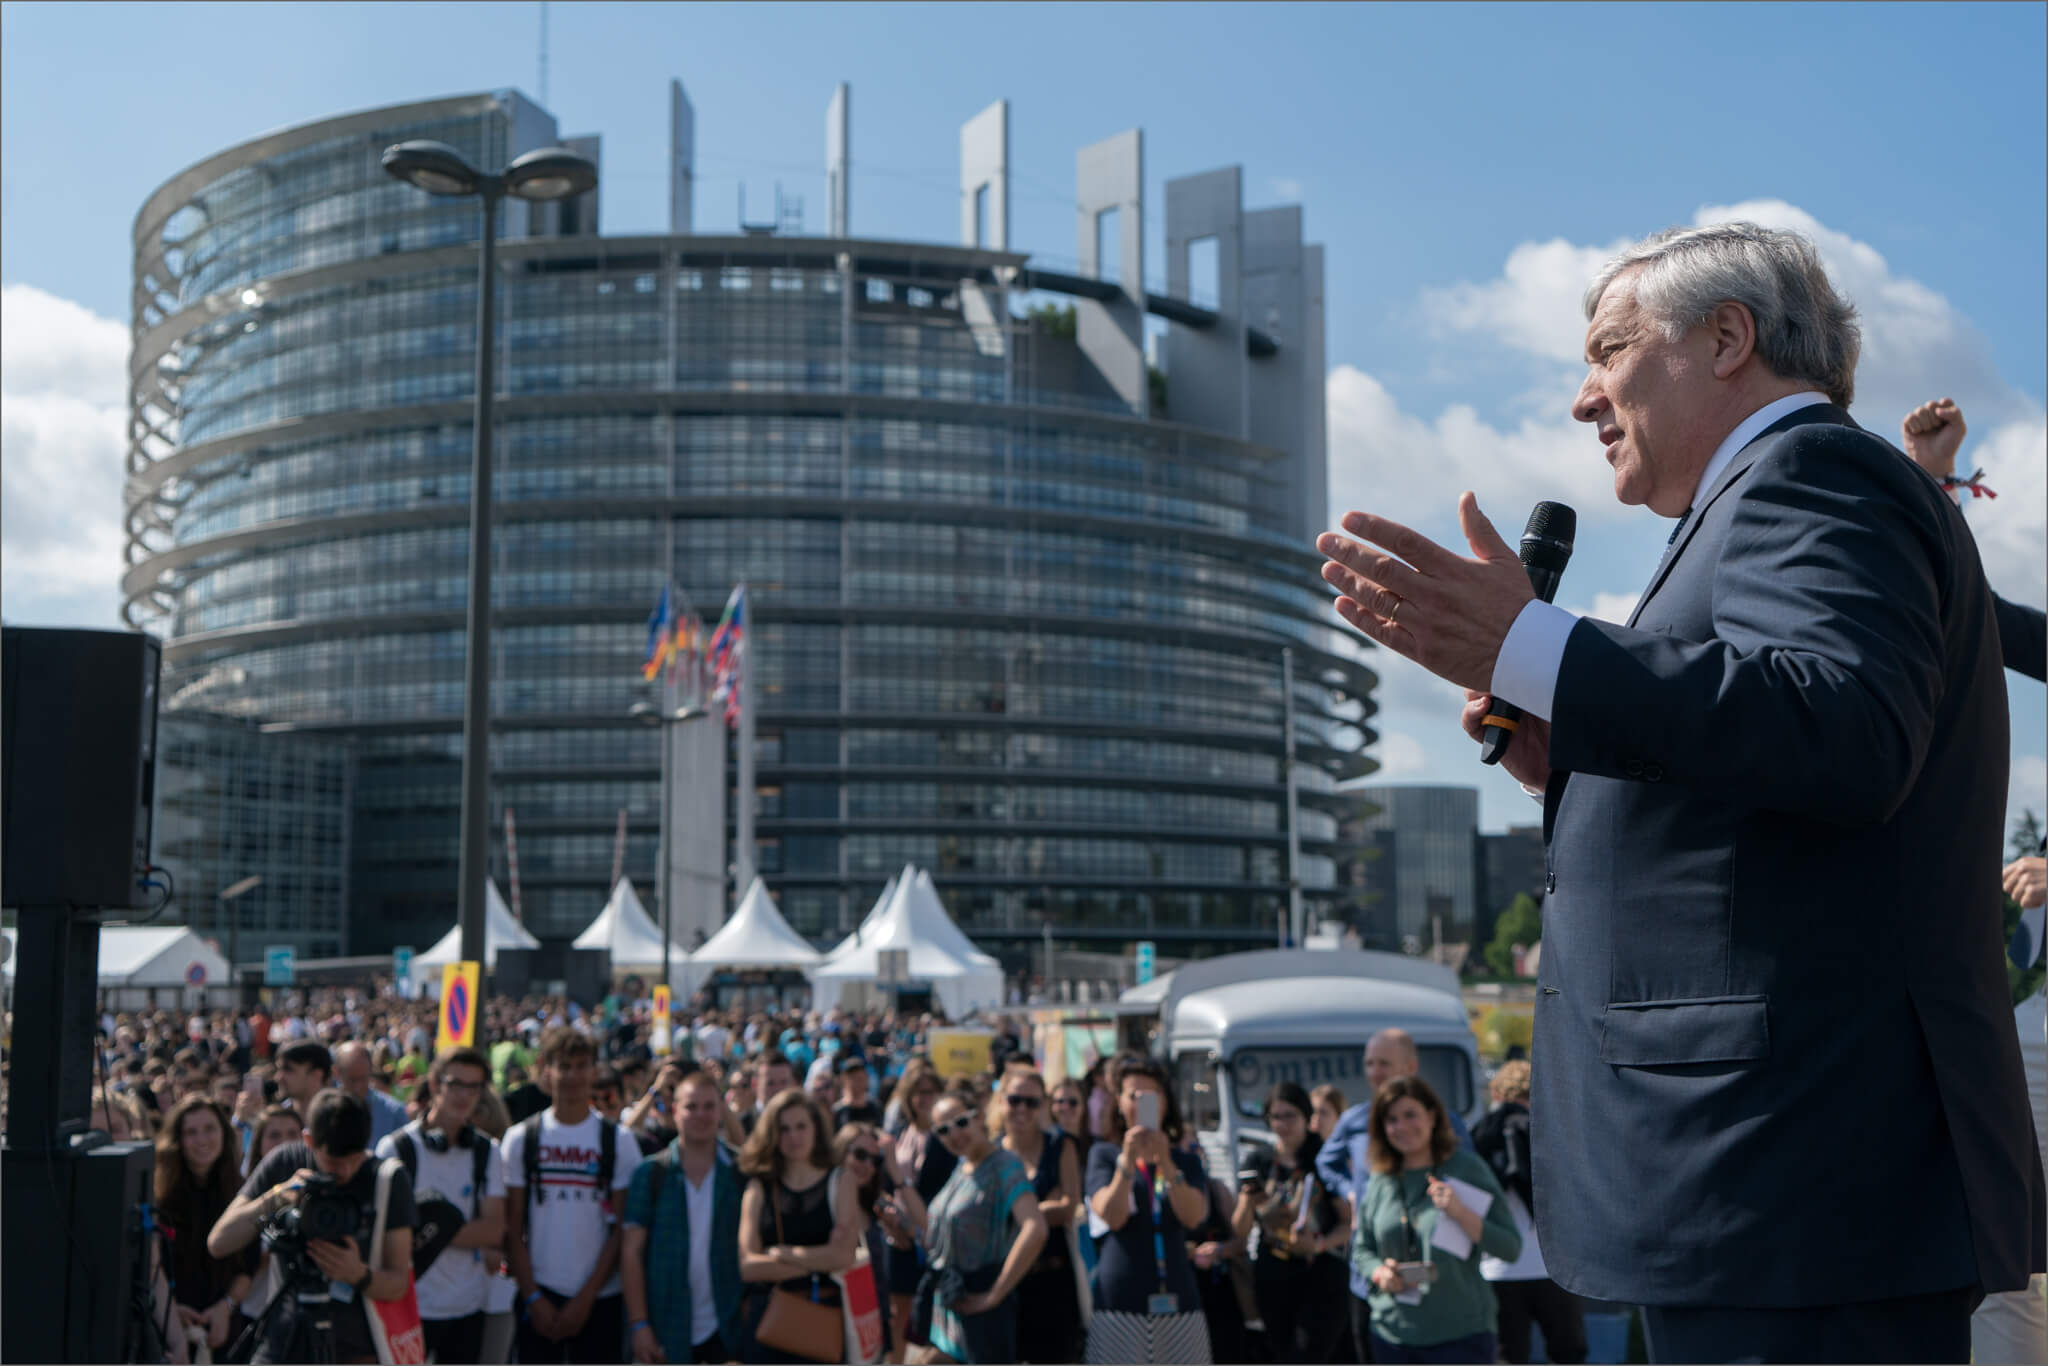 ©European Union 2018 - European Parliam